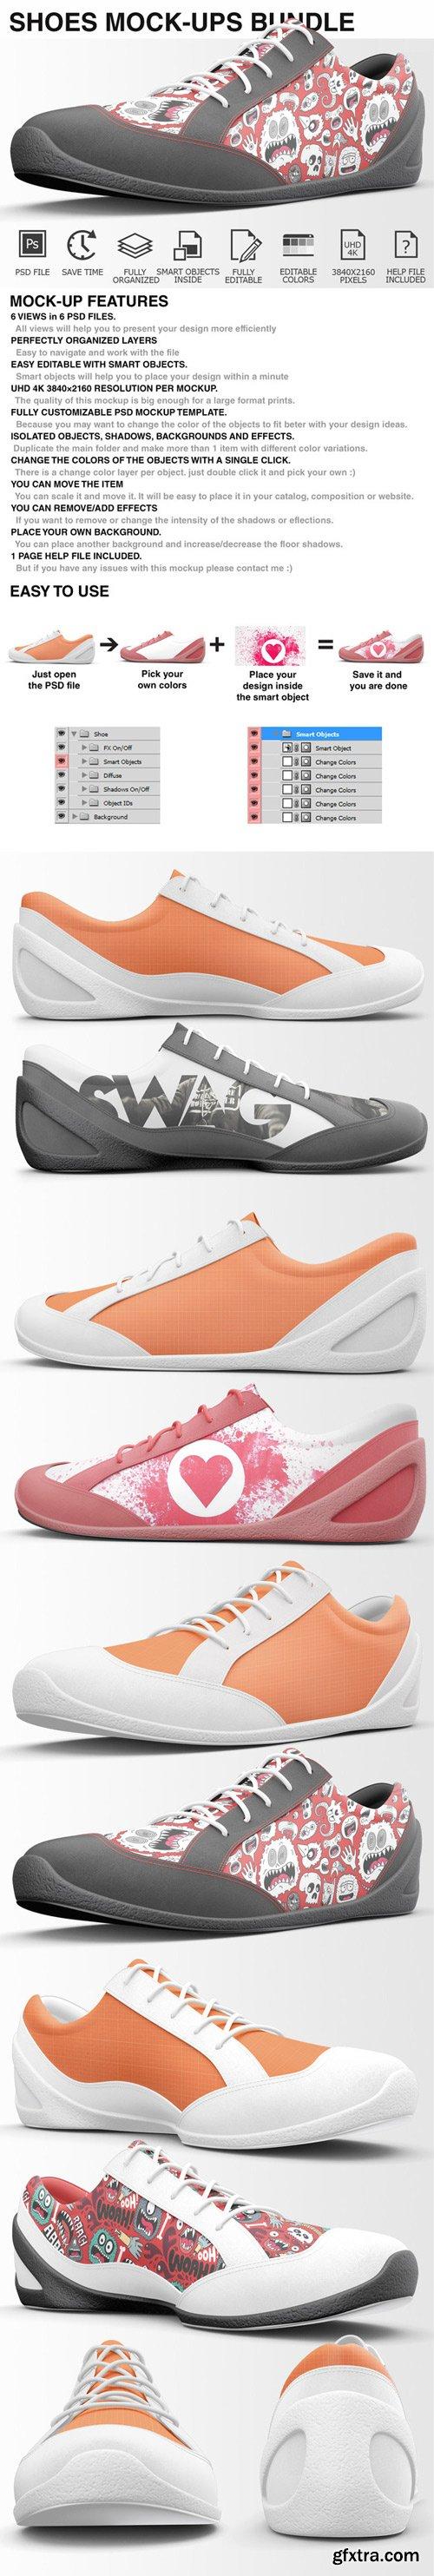 CM - Sneakers Shoes Mockups Bundle 401876